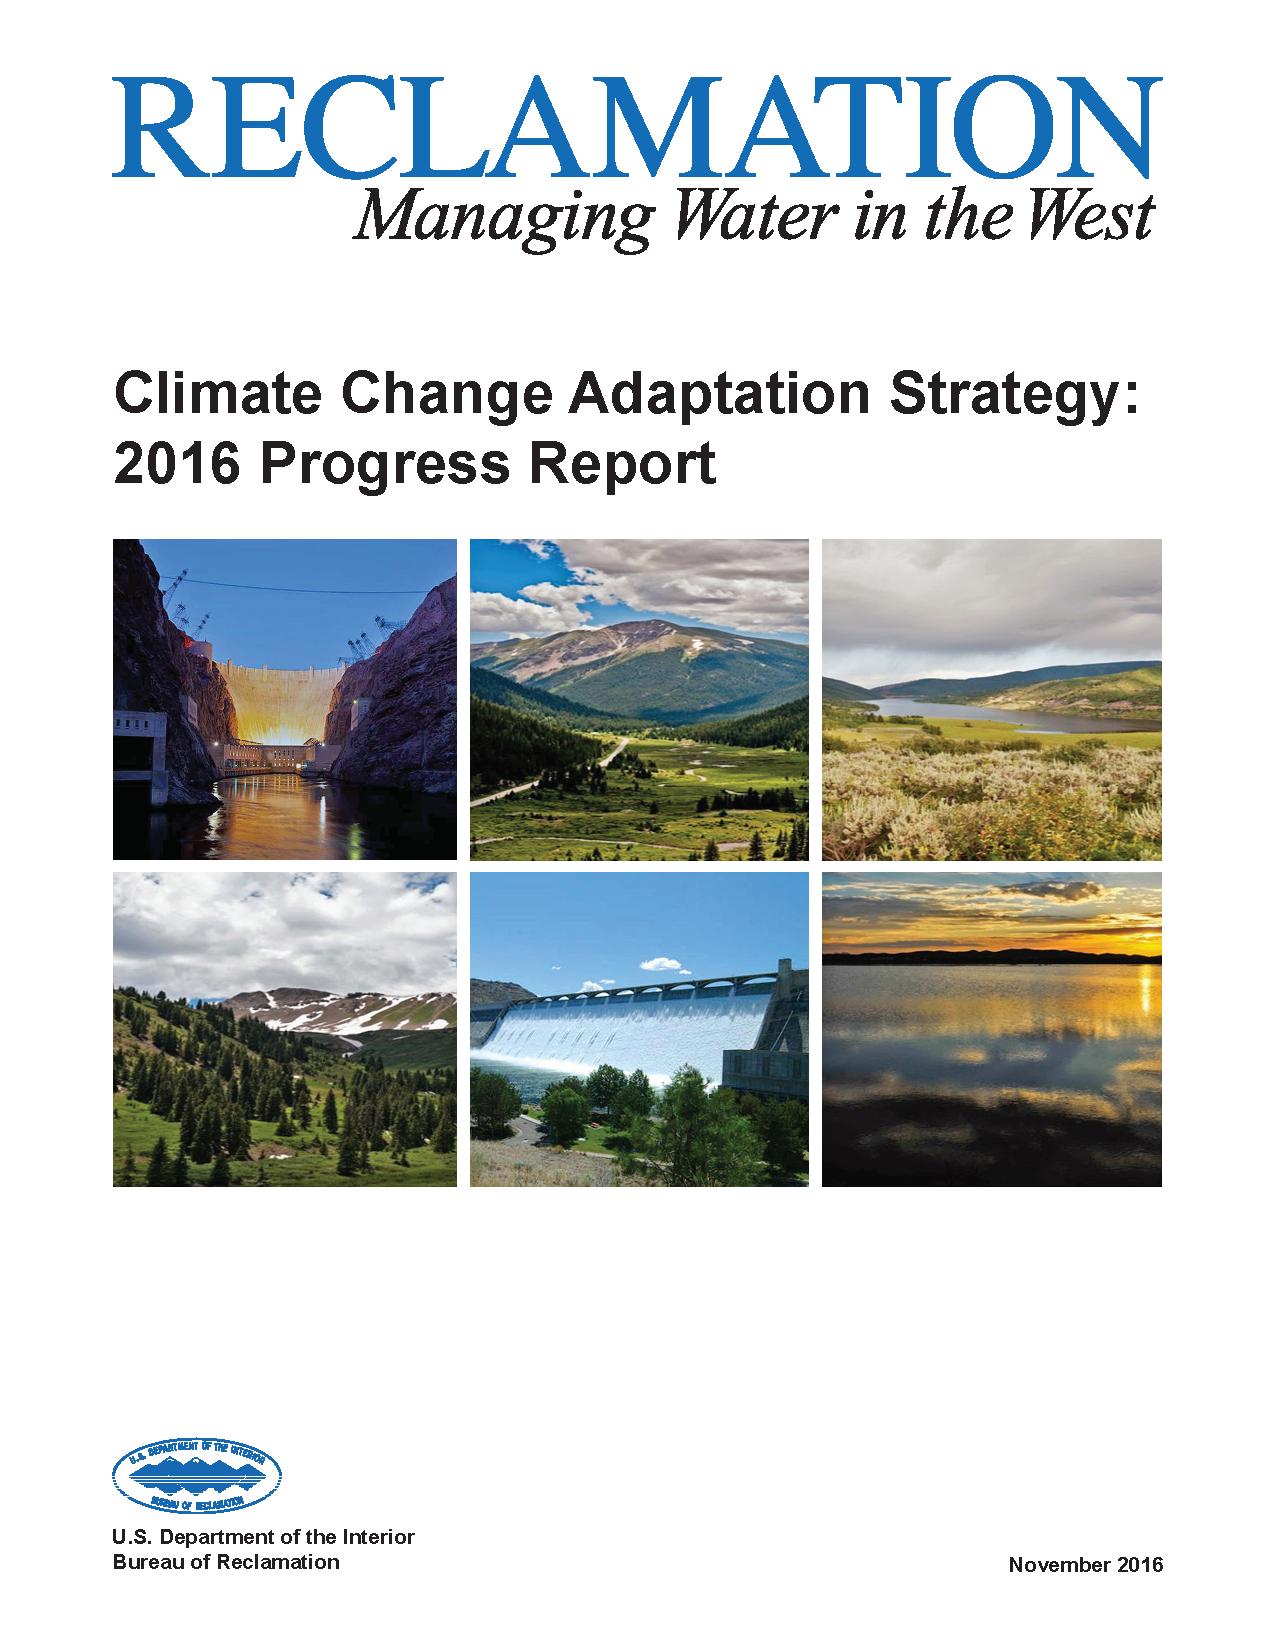 Climate Change Adaptation Strategy Progress Report